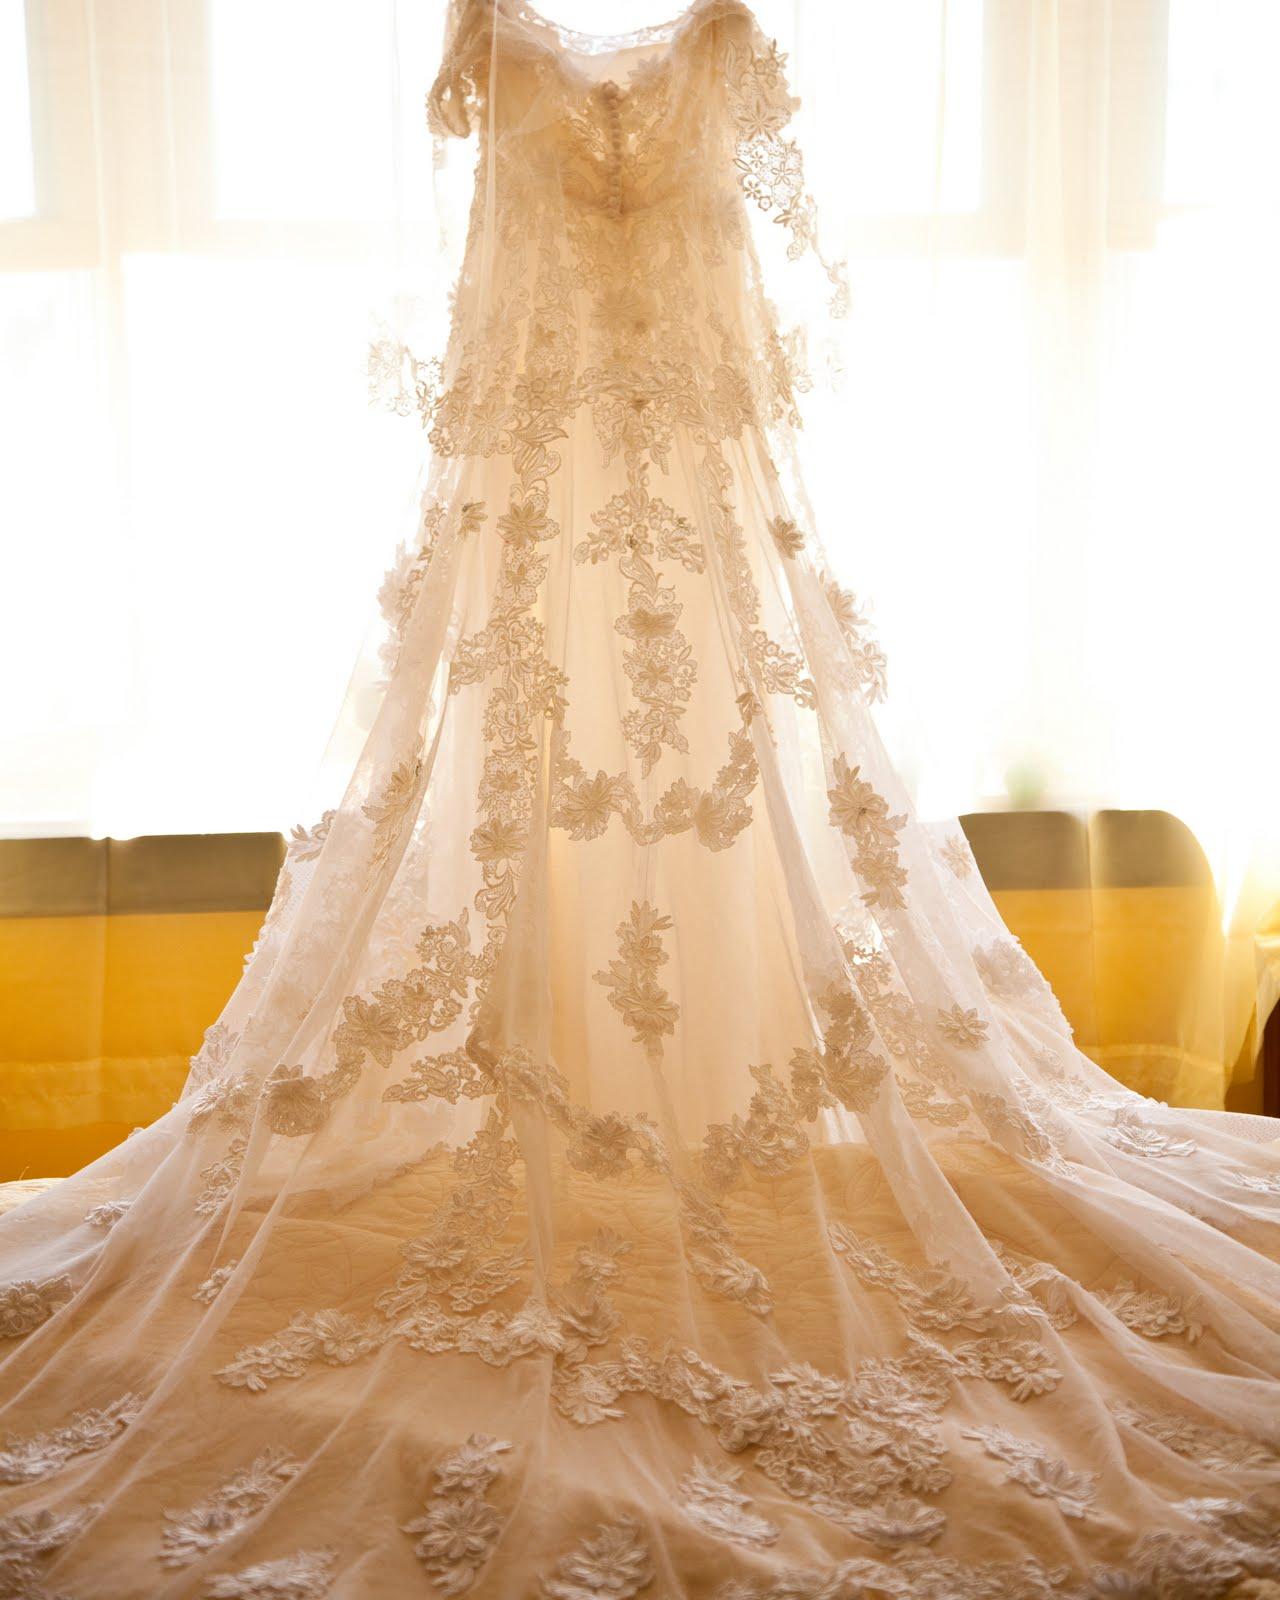 SW Photography- Quincy MA Wedding Photographer: Priscilla ...